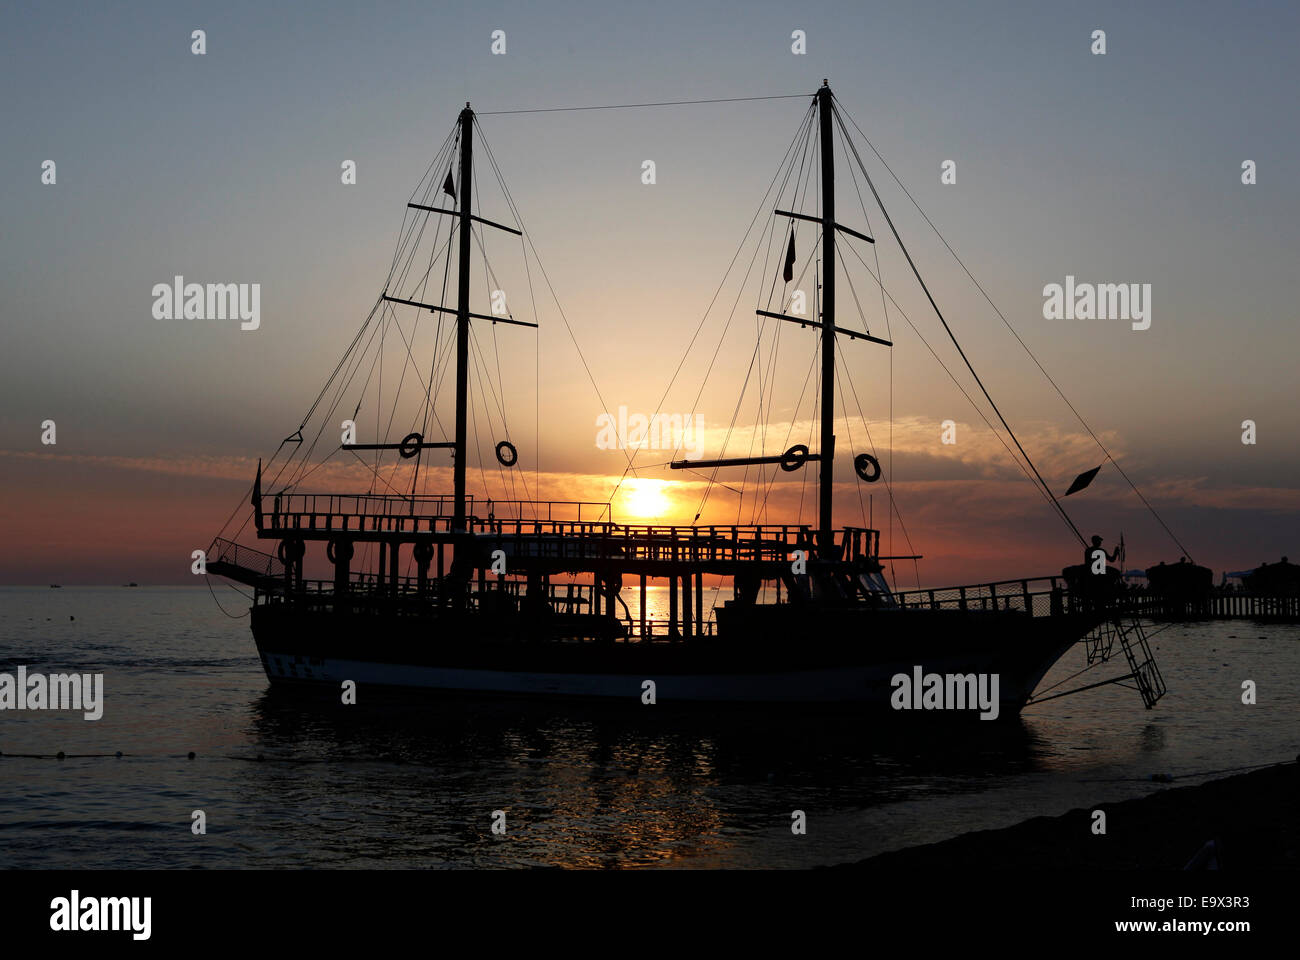 Excursion sailing boat anchored on the beach at sunset, Manavgat, Antalya, Turkey, Asia - Stock Image